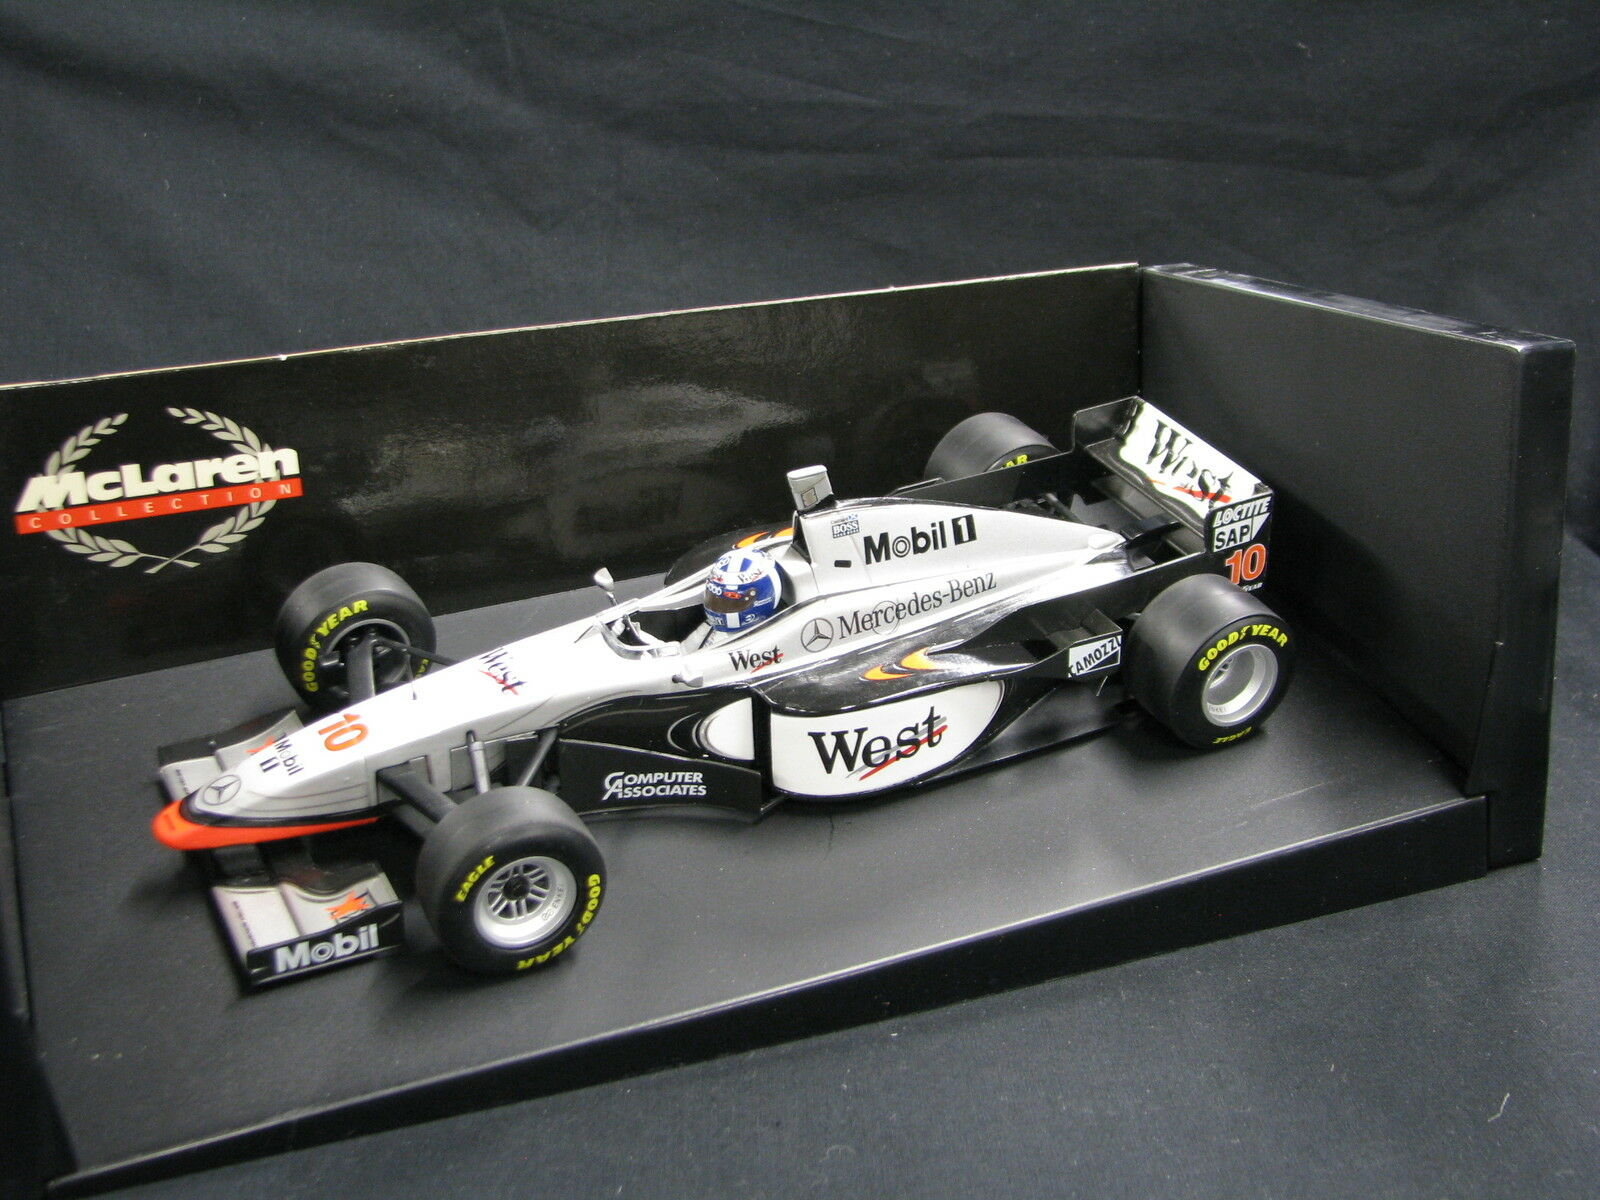 Minichamps West McLaren Mercedes MP4 12 1997 1 18  10 David Coulthard (JS) MC